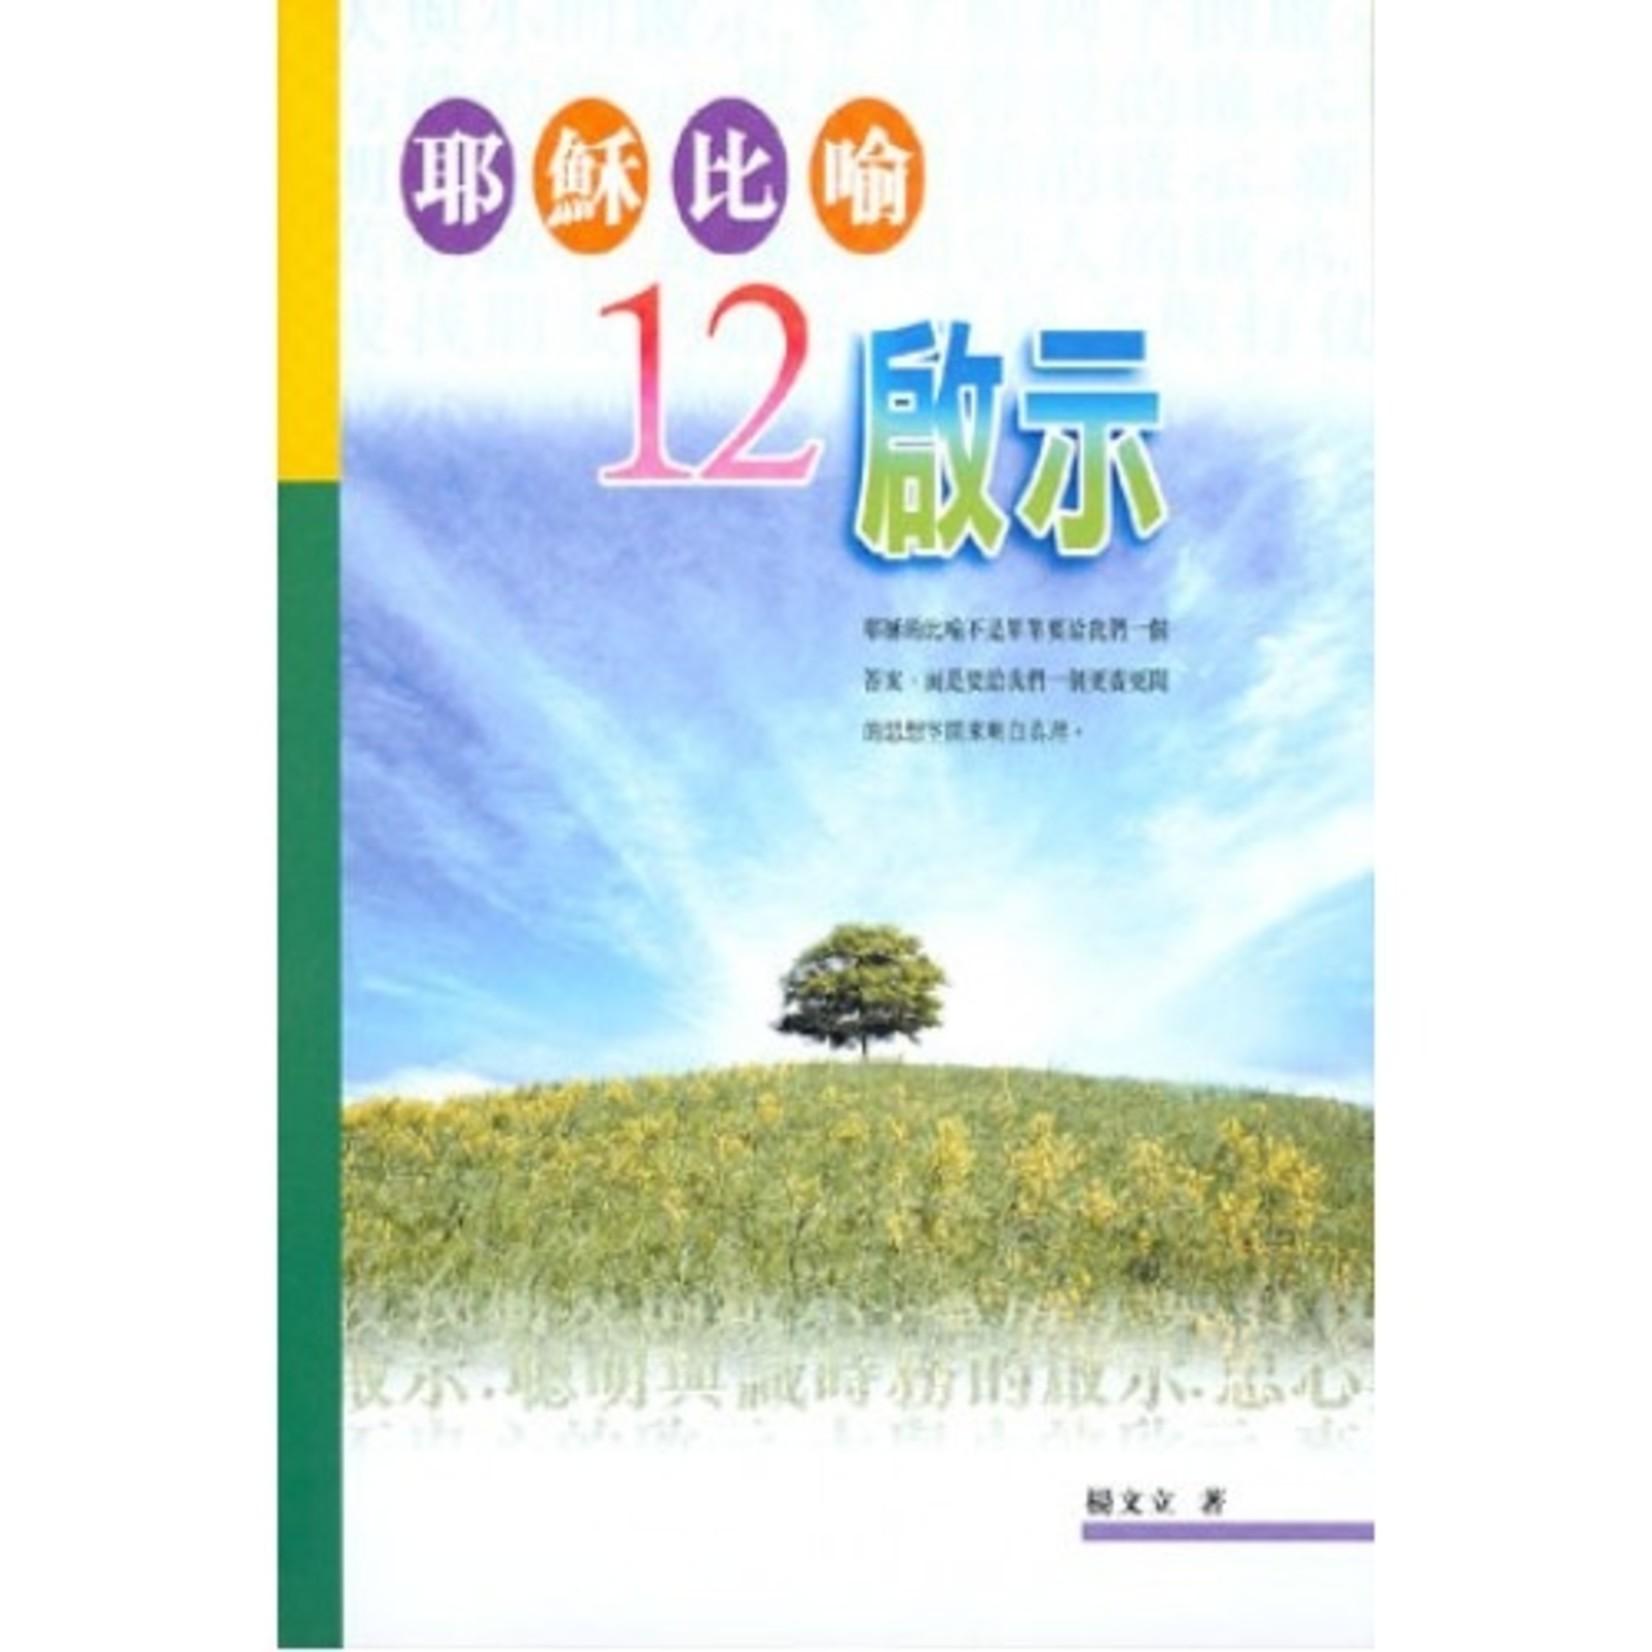 宣道 China Alliance Press 耶穌比喻12啟示